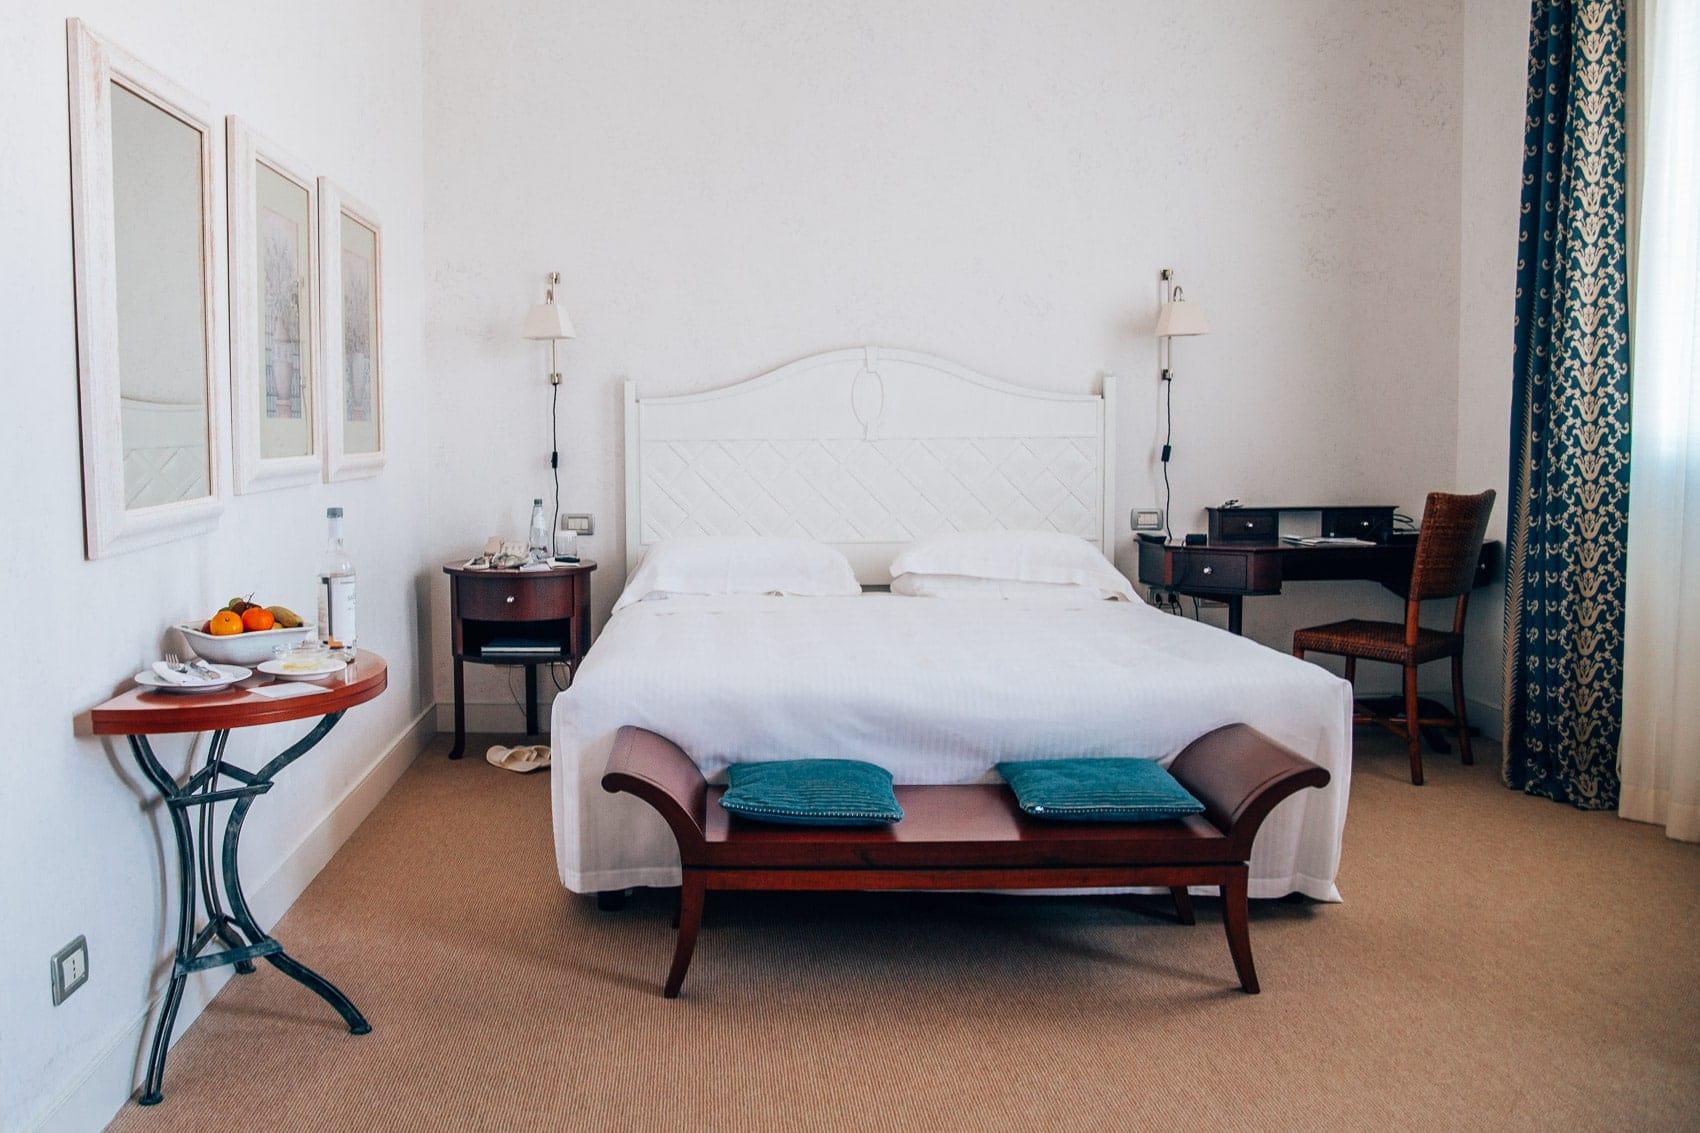 Wellnesshotel in der Toskana/ Maremma - Terme di Saturnia Spa & Golf Resort